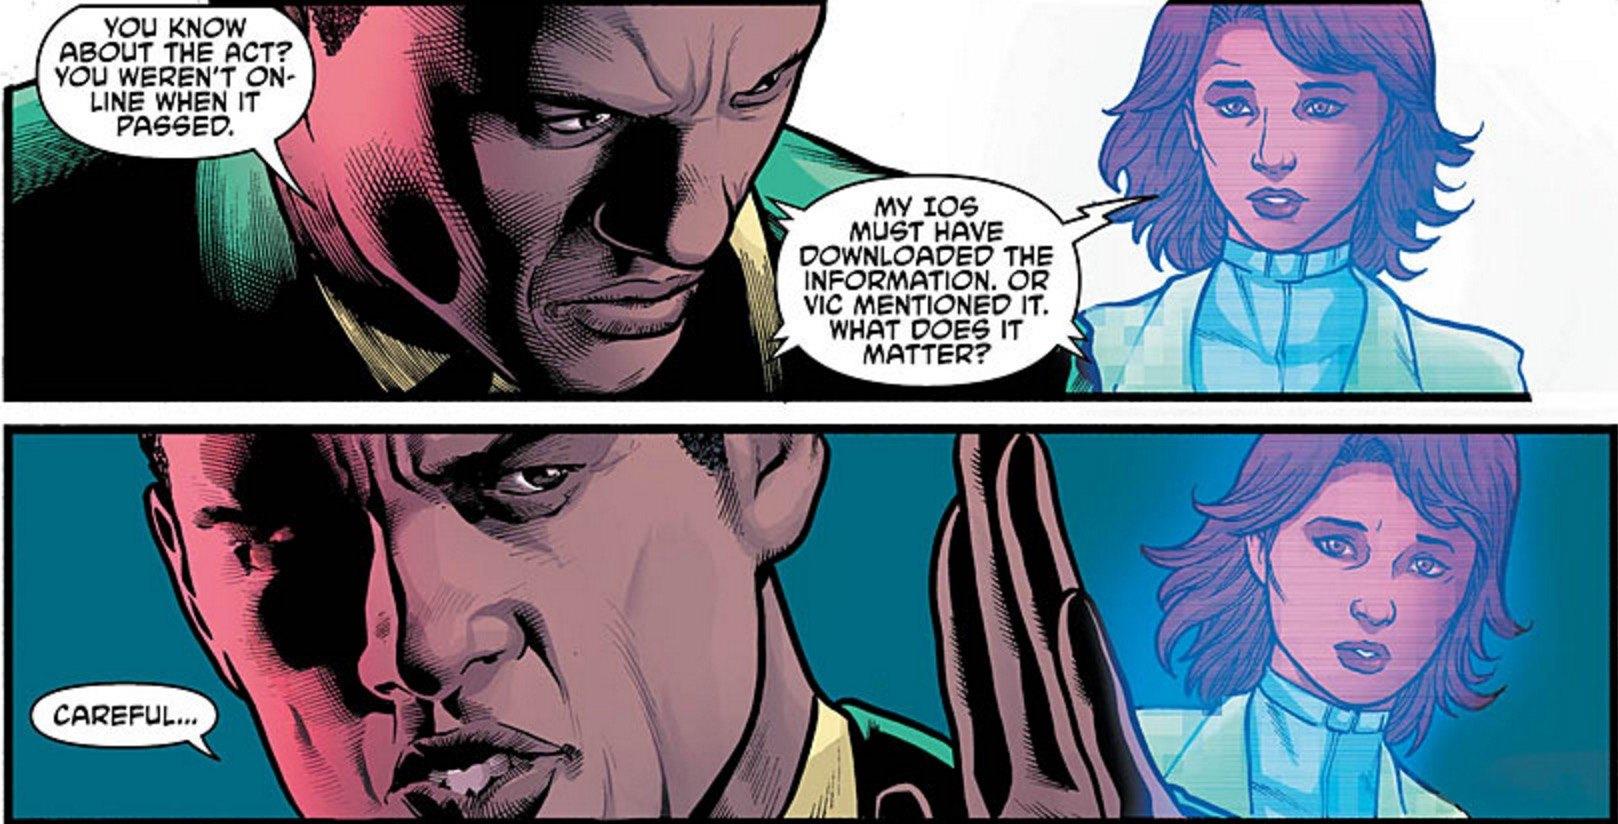 Cyborg #10 Panel 2